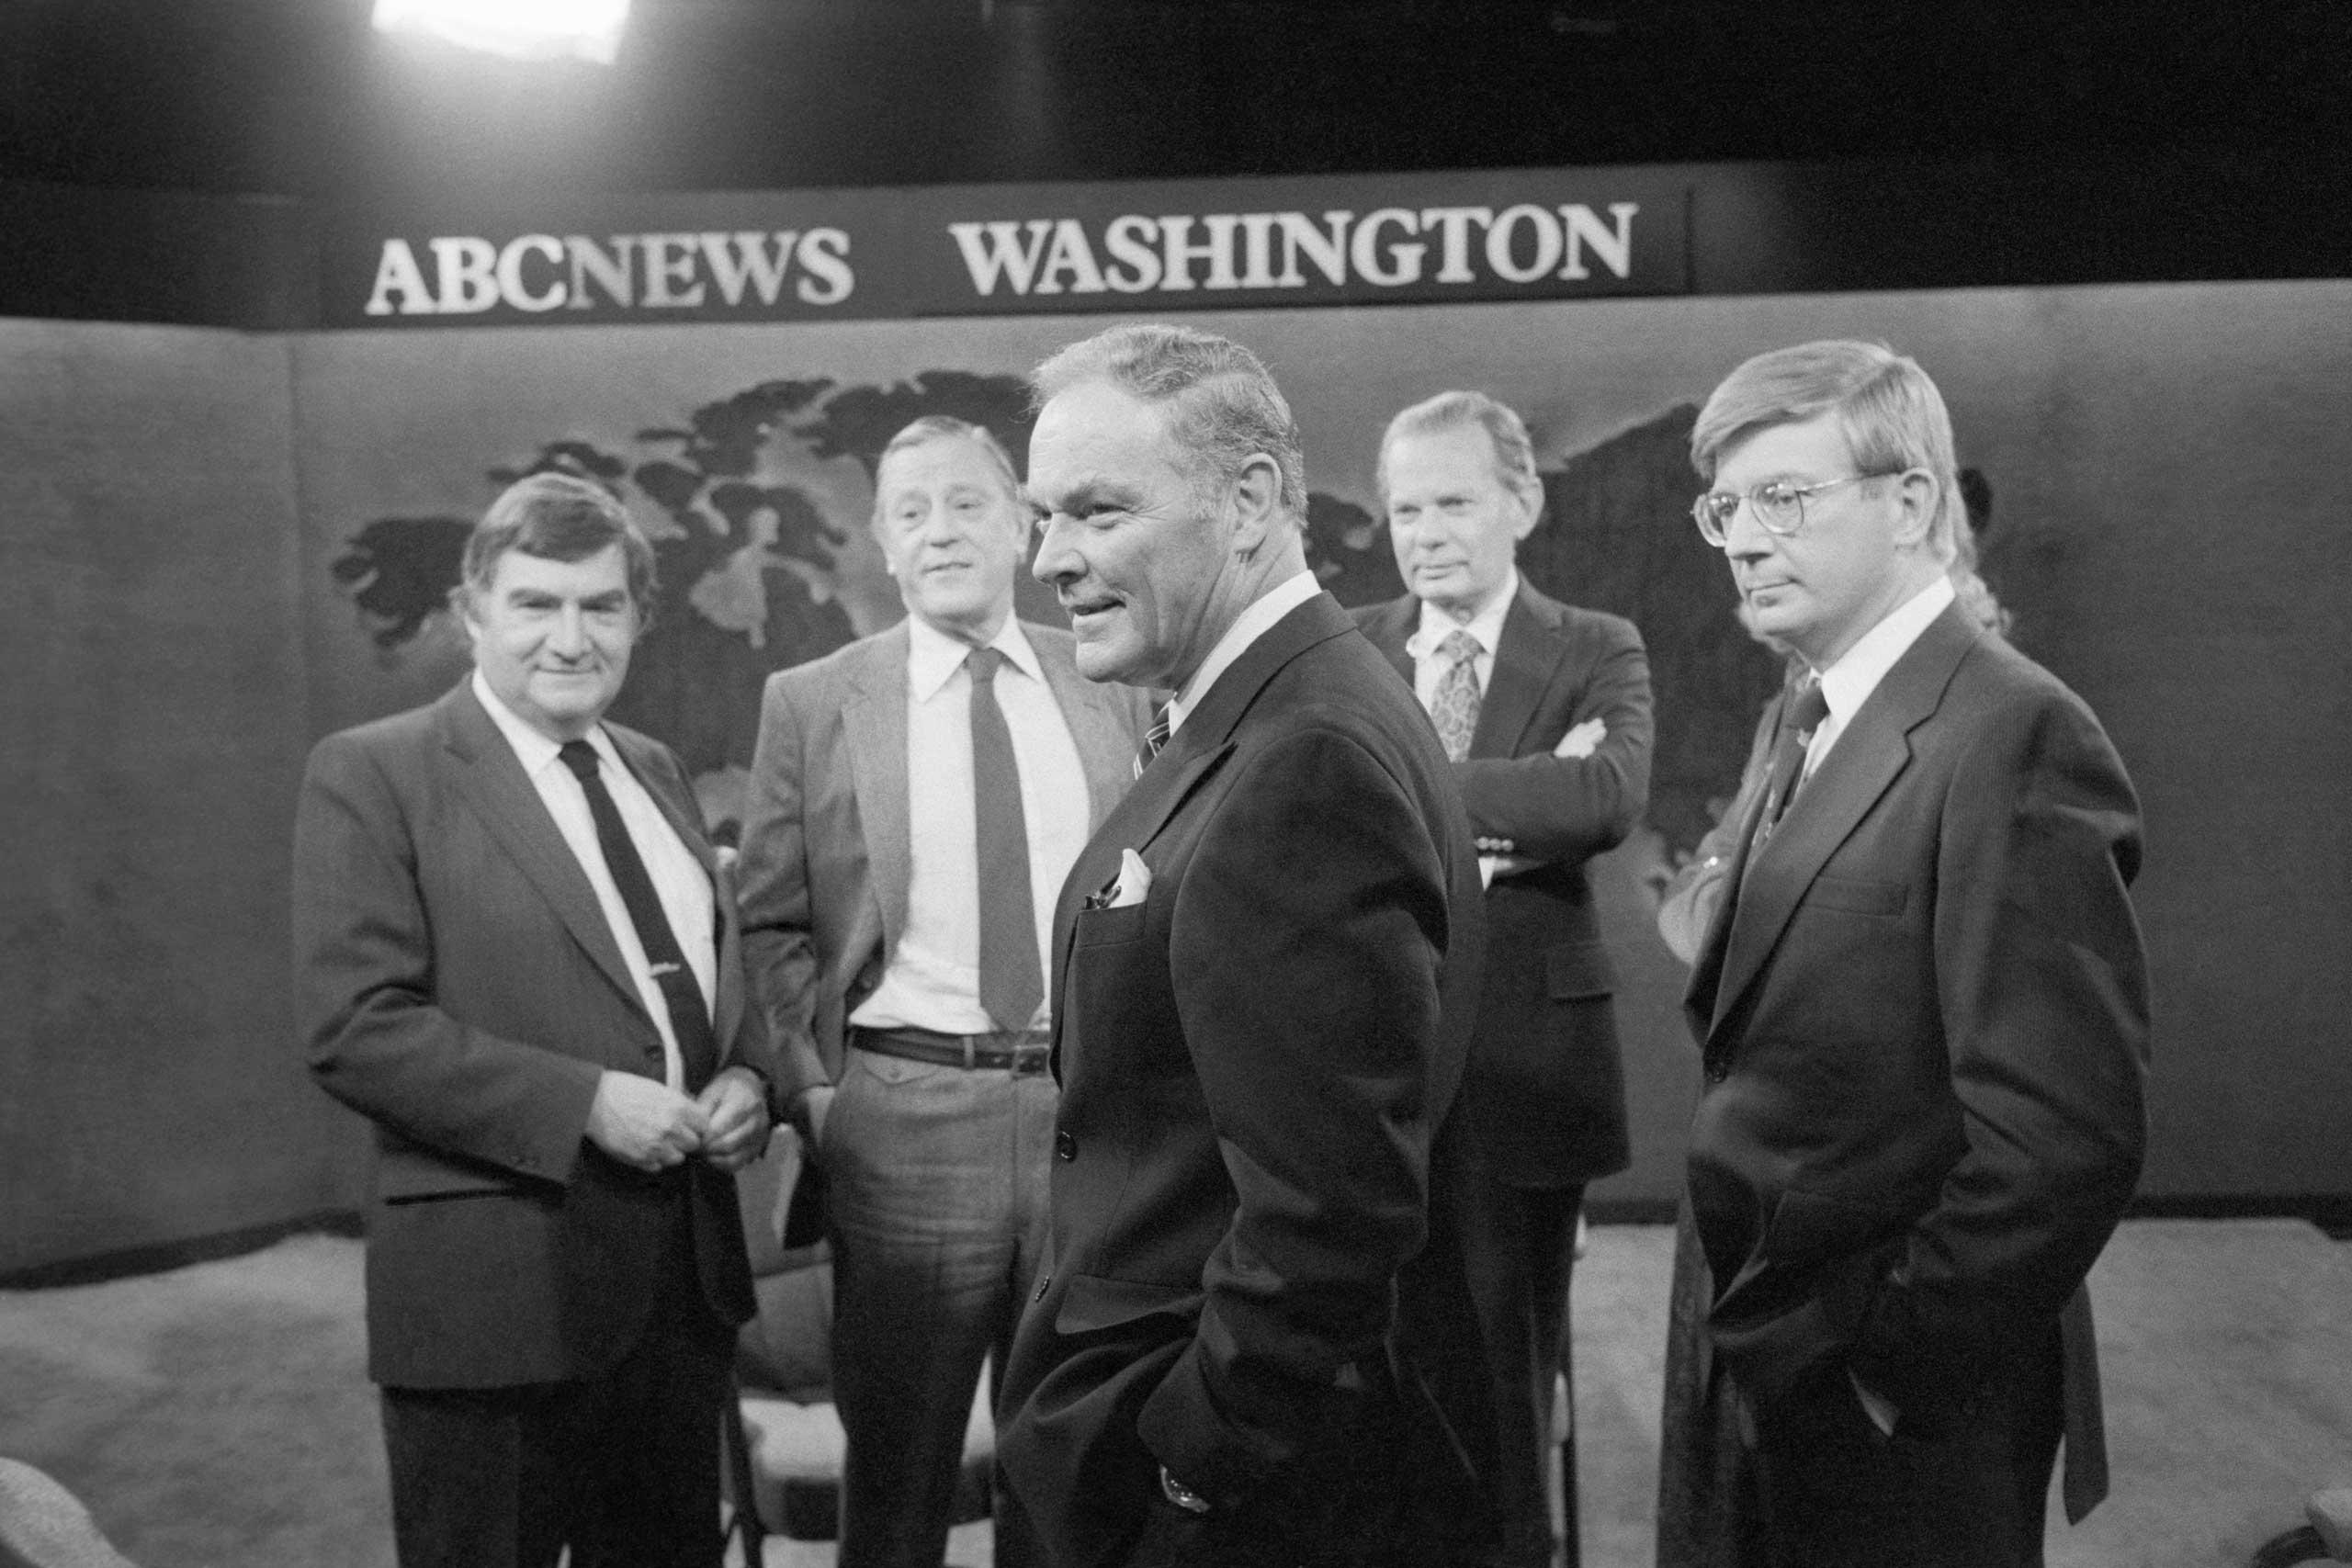 From Left: ABC Paris Bureau Chief Pierre Salinger, Washington Post Editor Benjamin Bradlee, David Brinkley and Alexander Haig (front center) before appearing on  This Week with David Brinkley  on Nov. 22, 1981.